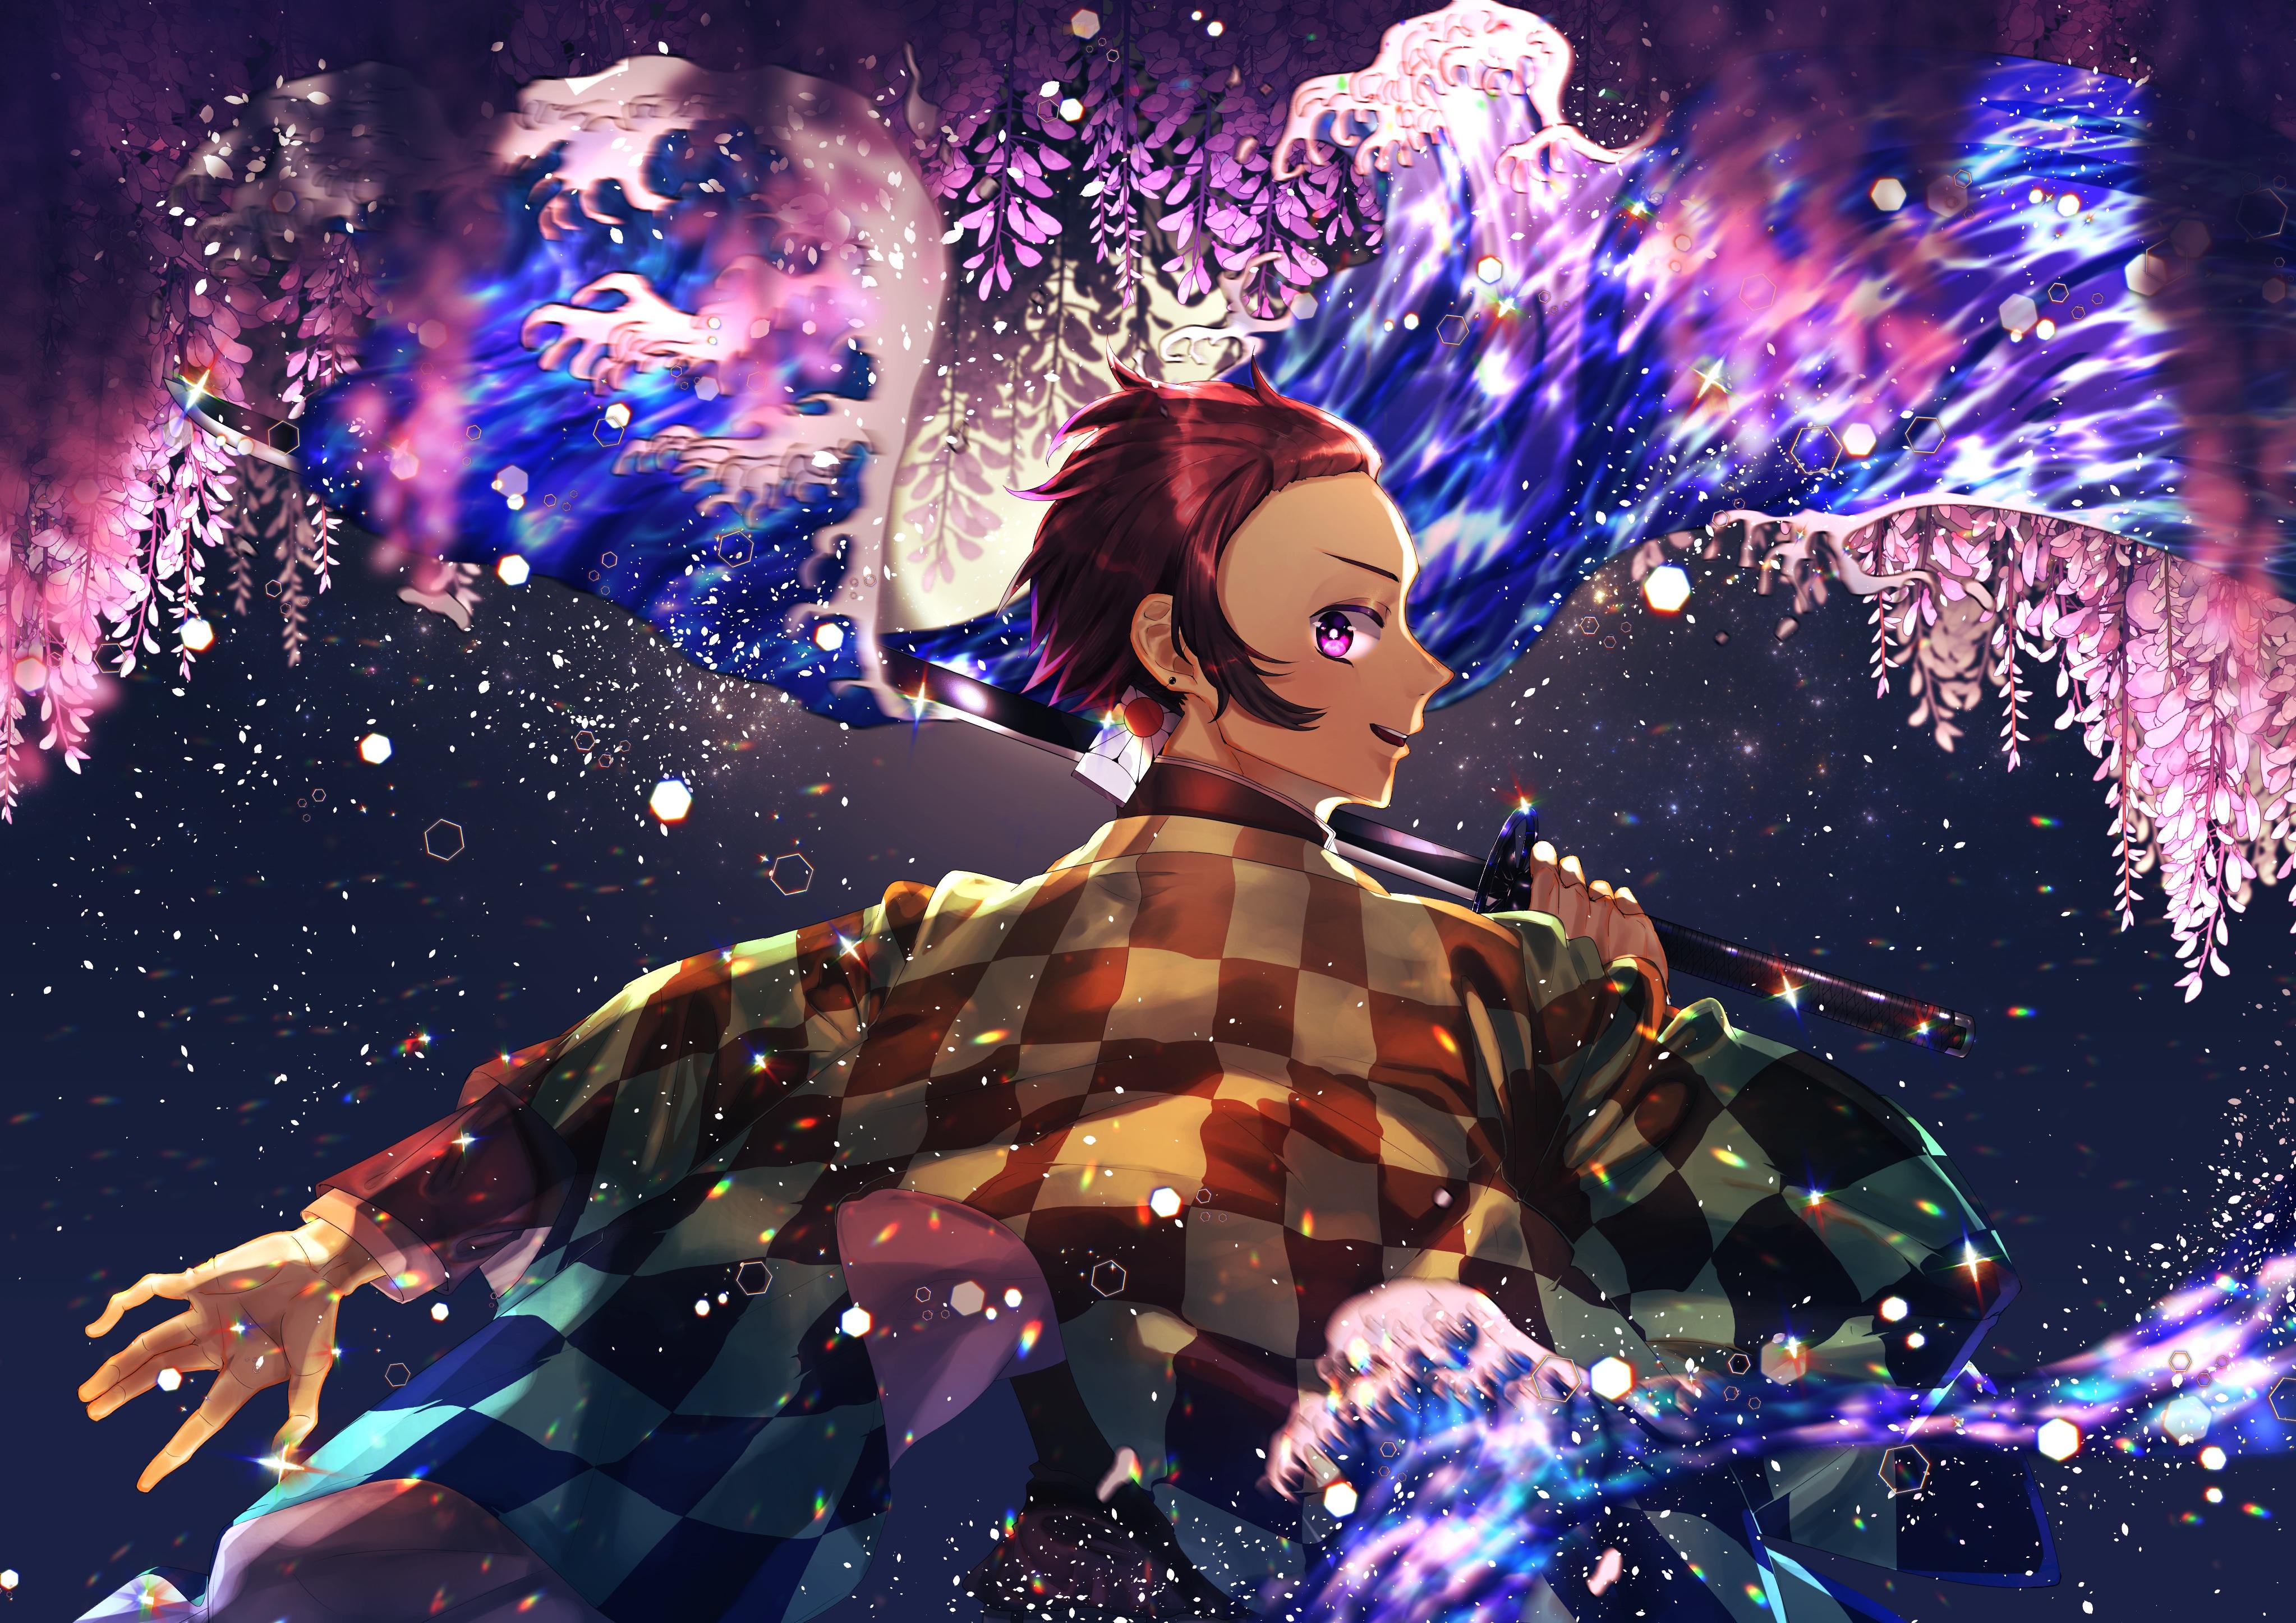 Demon Slayer Kimetsu No Yaiba 4k Ultra Hd Wallpaper Background